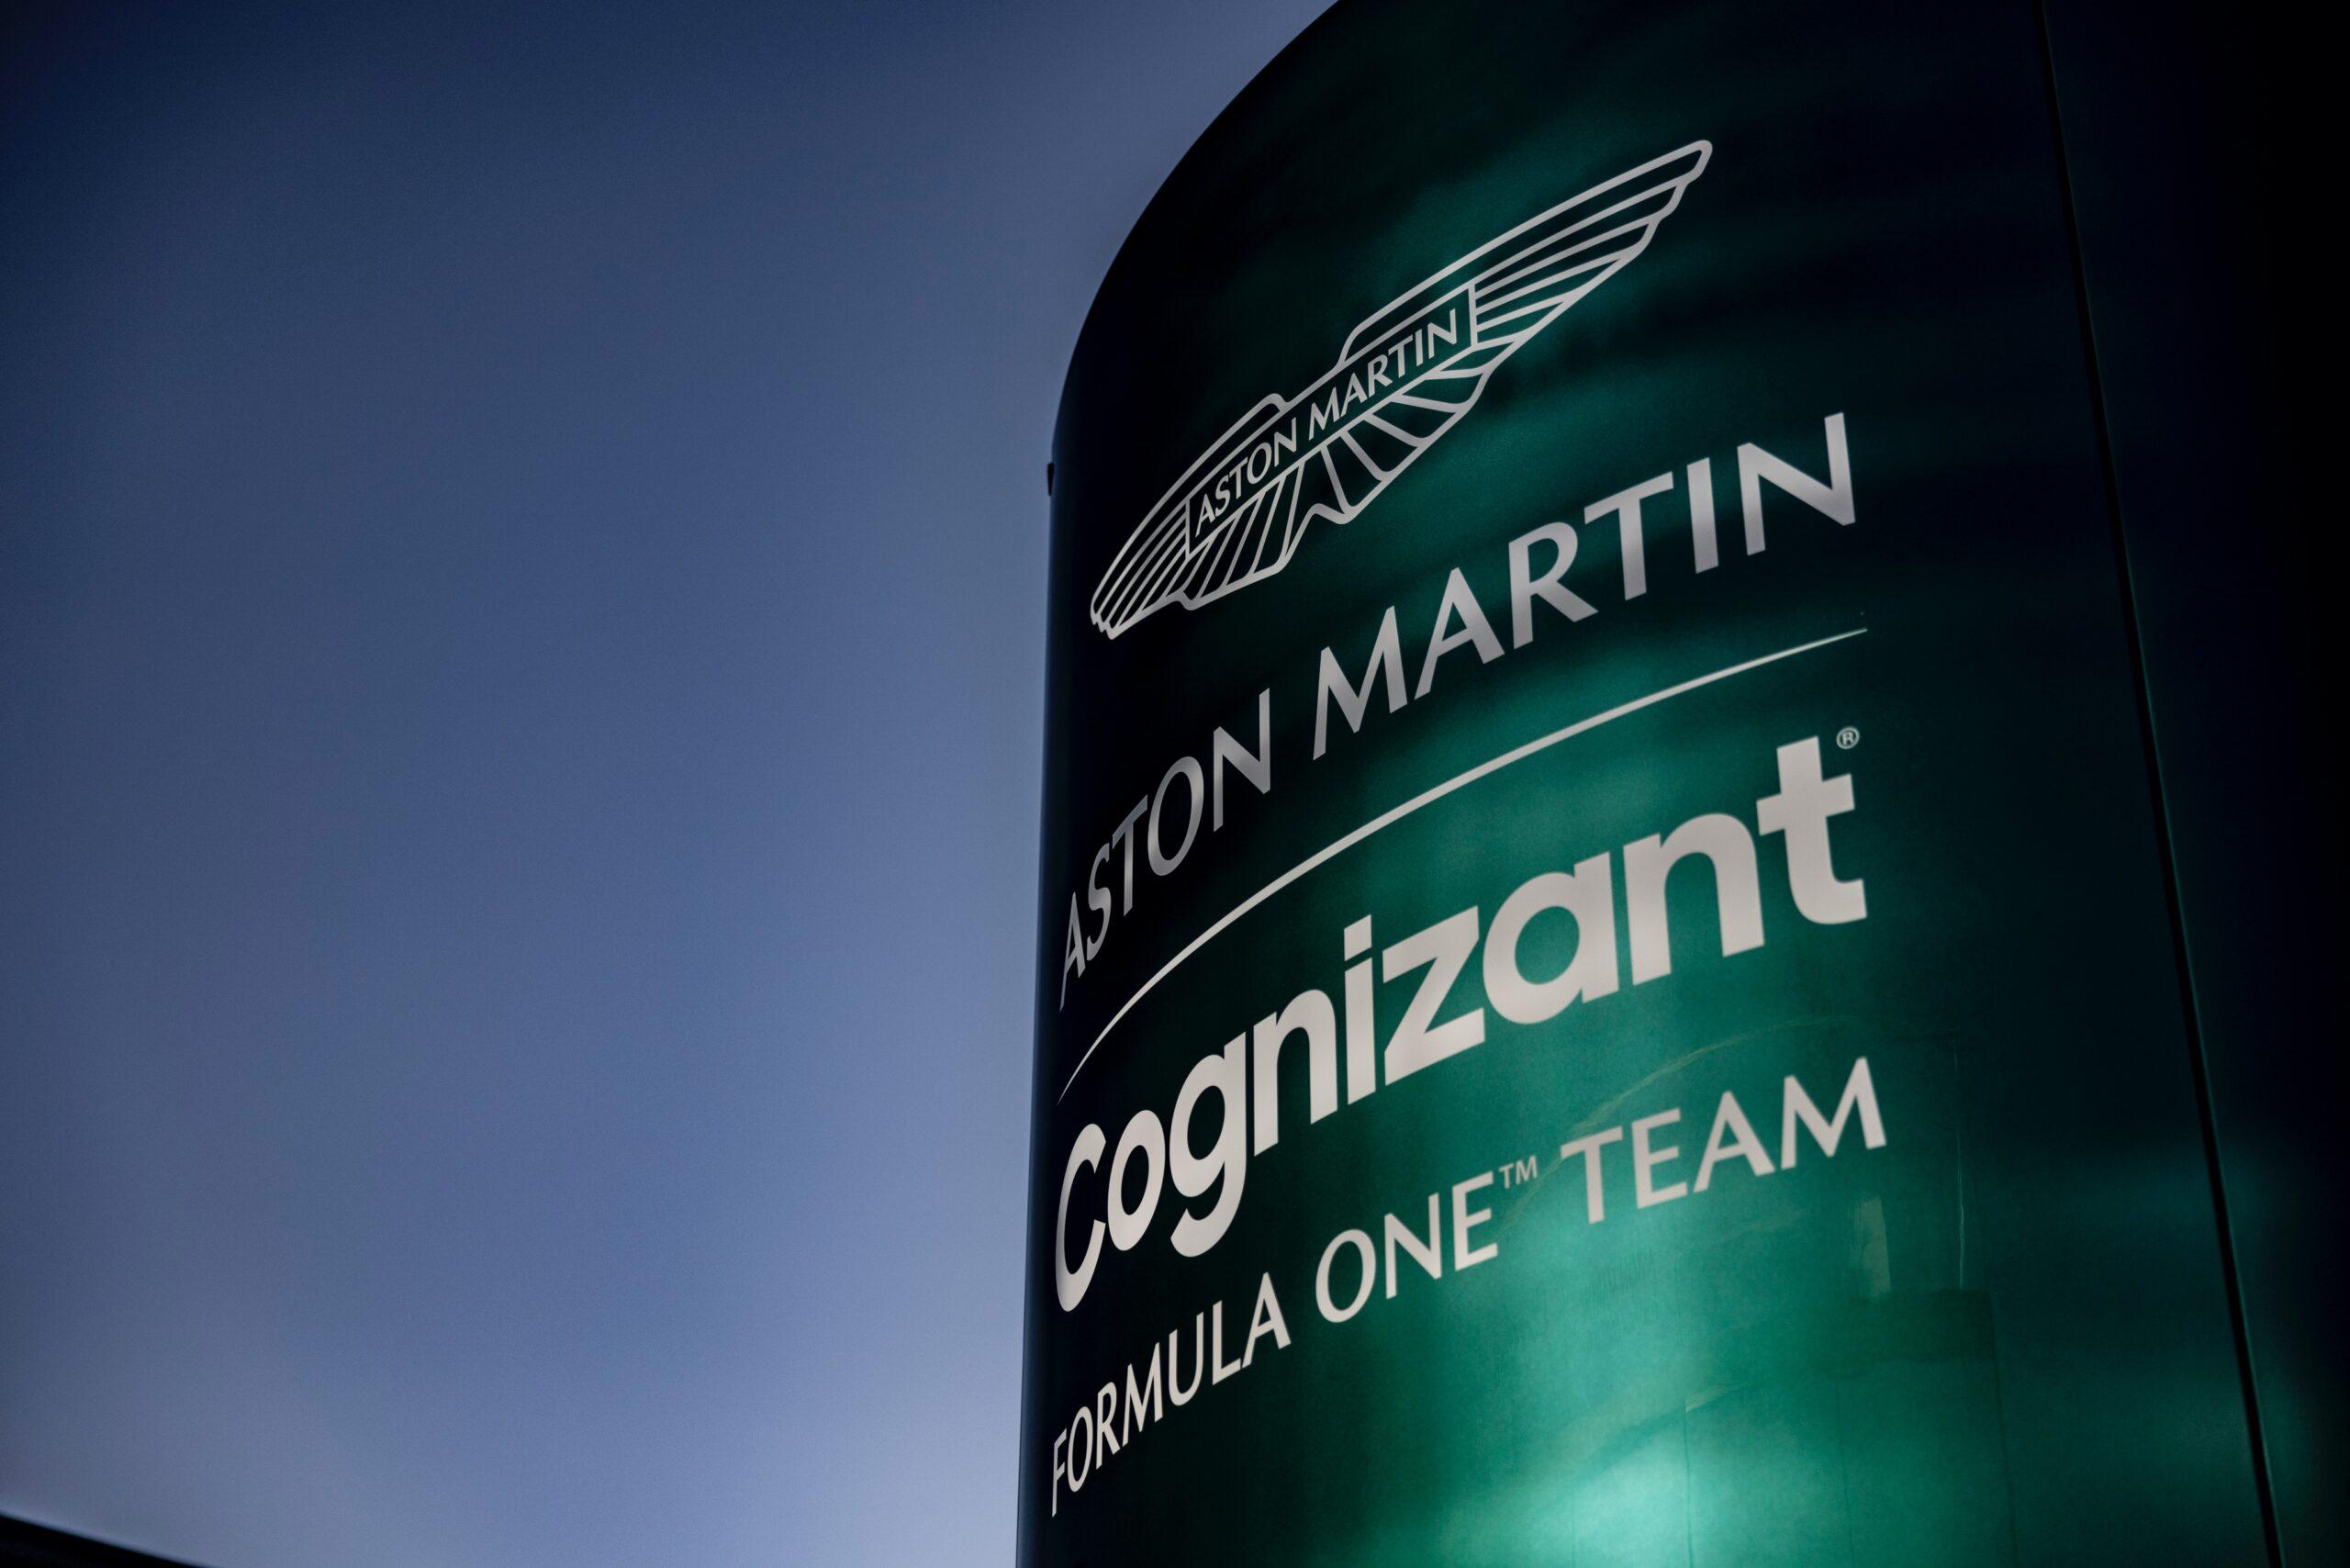 F1 - Officiel : l'équipe Aston Martin F1 retire son appel